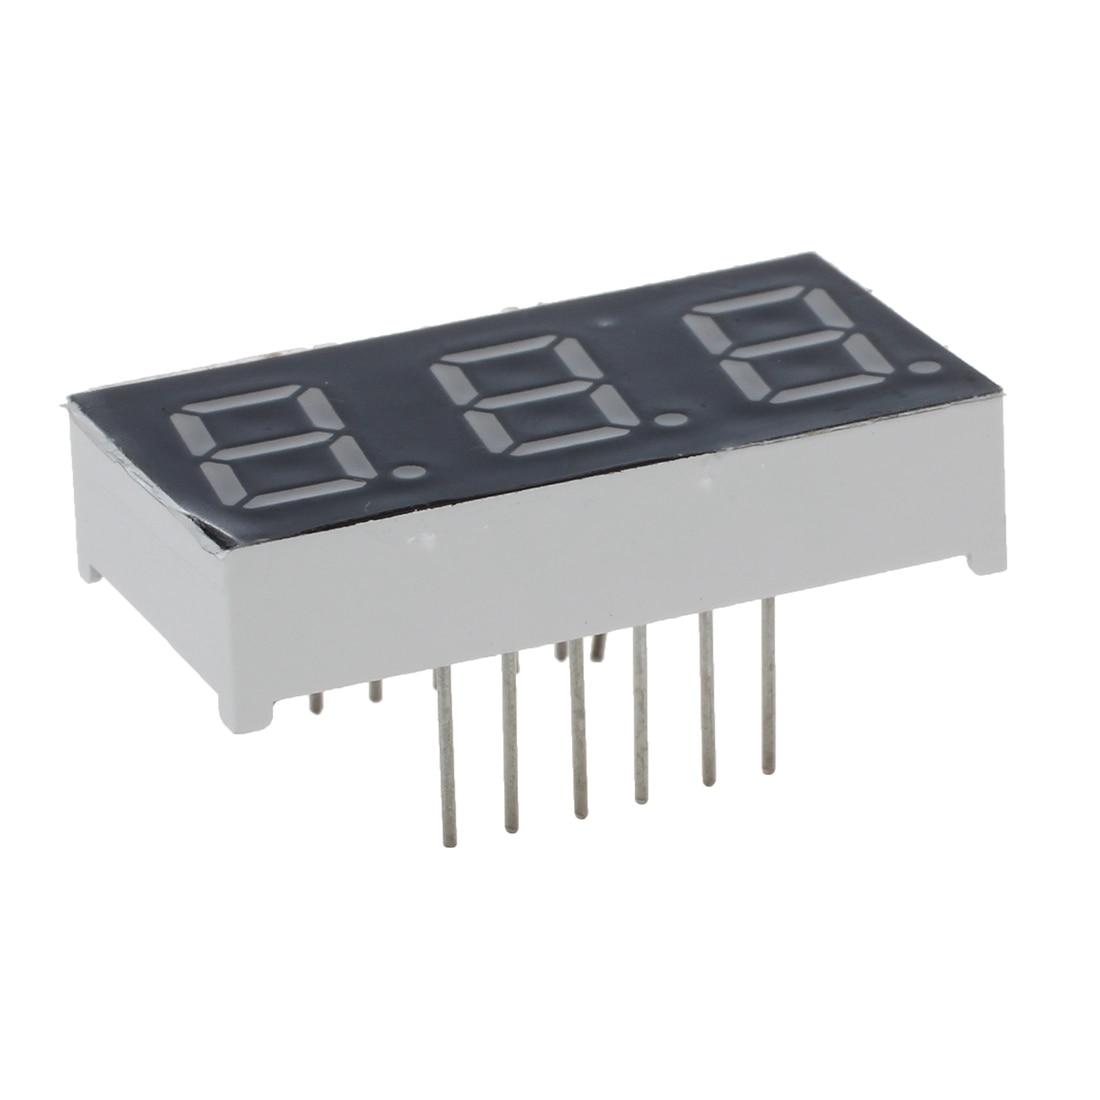 DSHA New Hot 5 Pcs Common Cathode 12 Pin 3 Bit 7 Segment 0.4